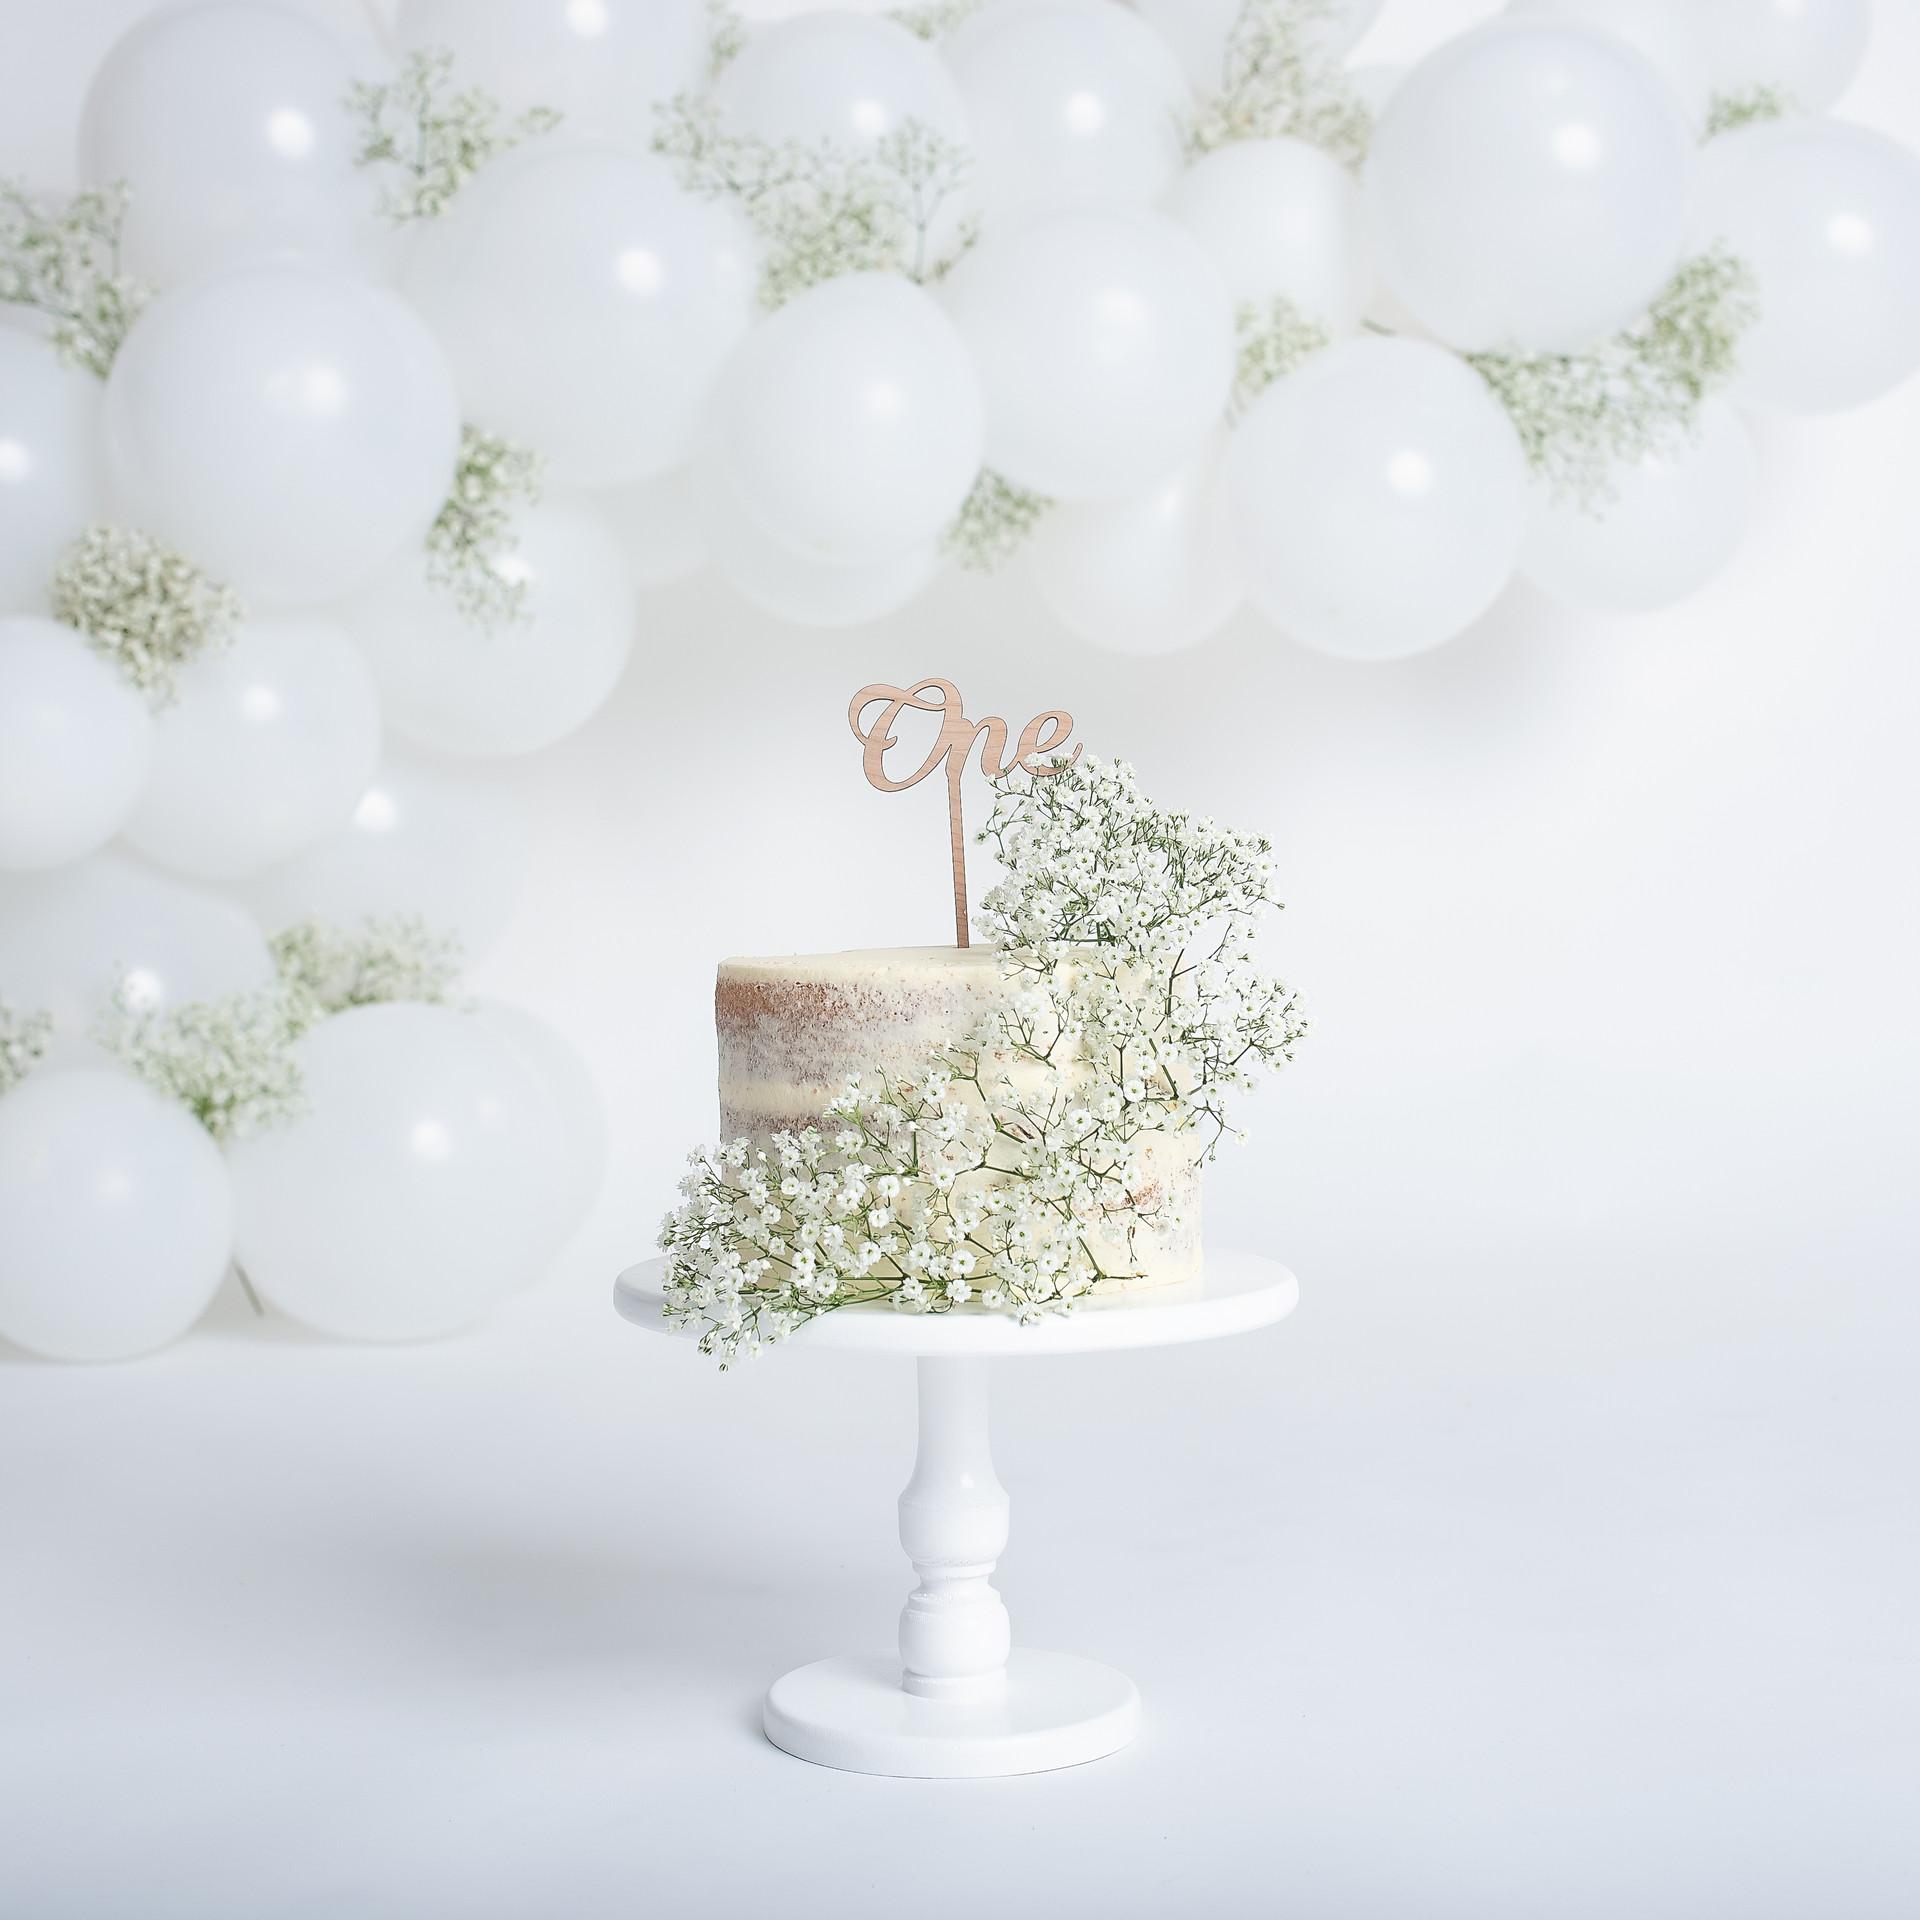 Cake Smash Photography Essex